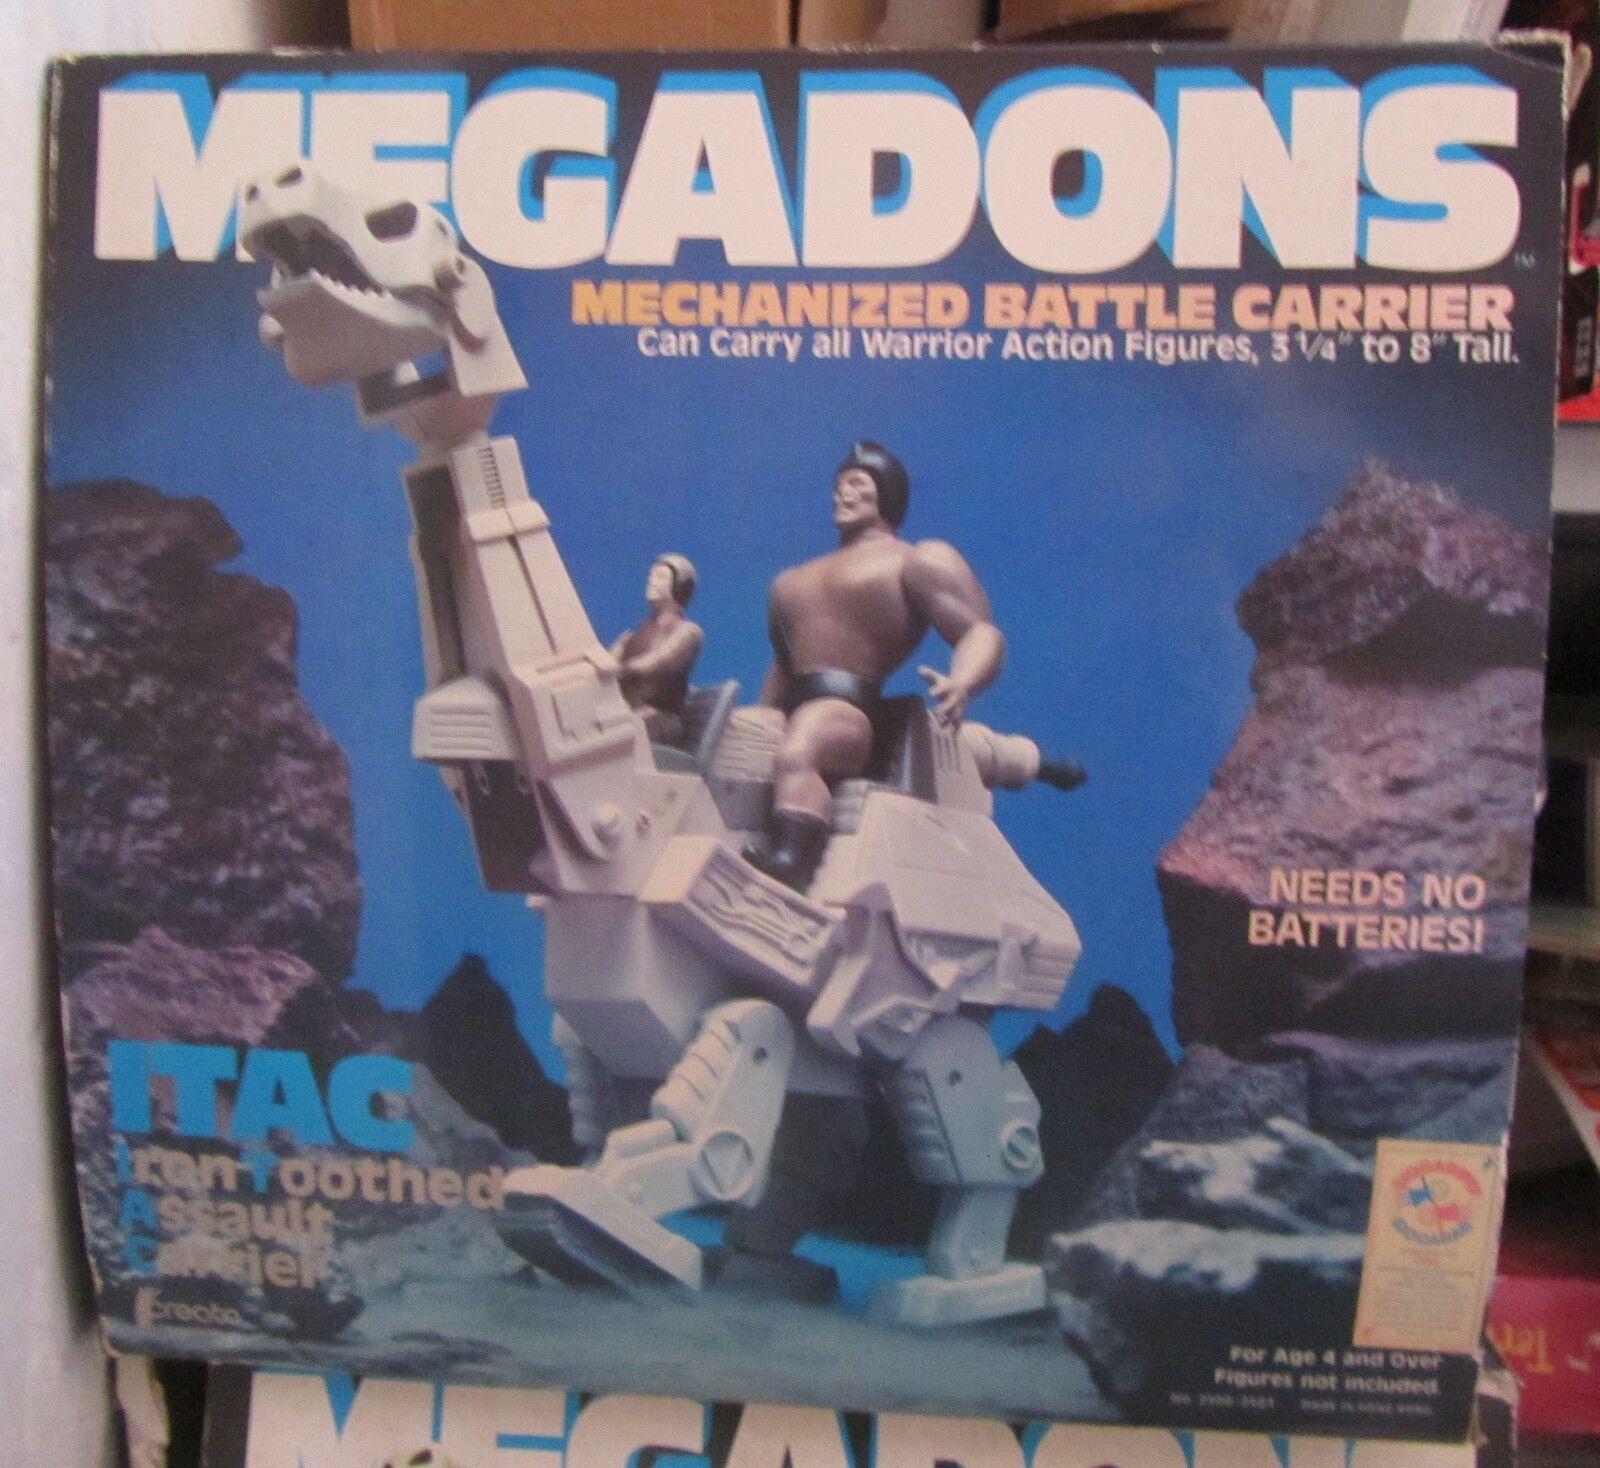 Megadons ITAC maskiniserad stridsbärare MOTU storlek SPESE GRATIS